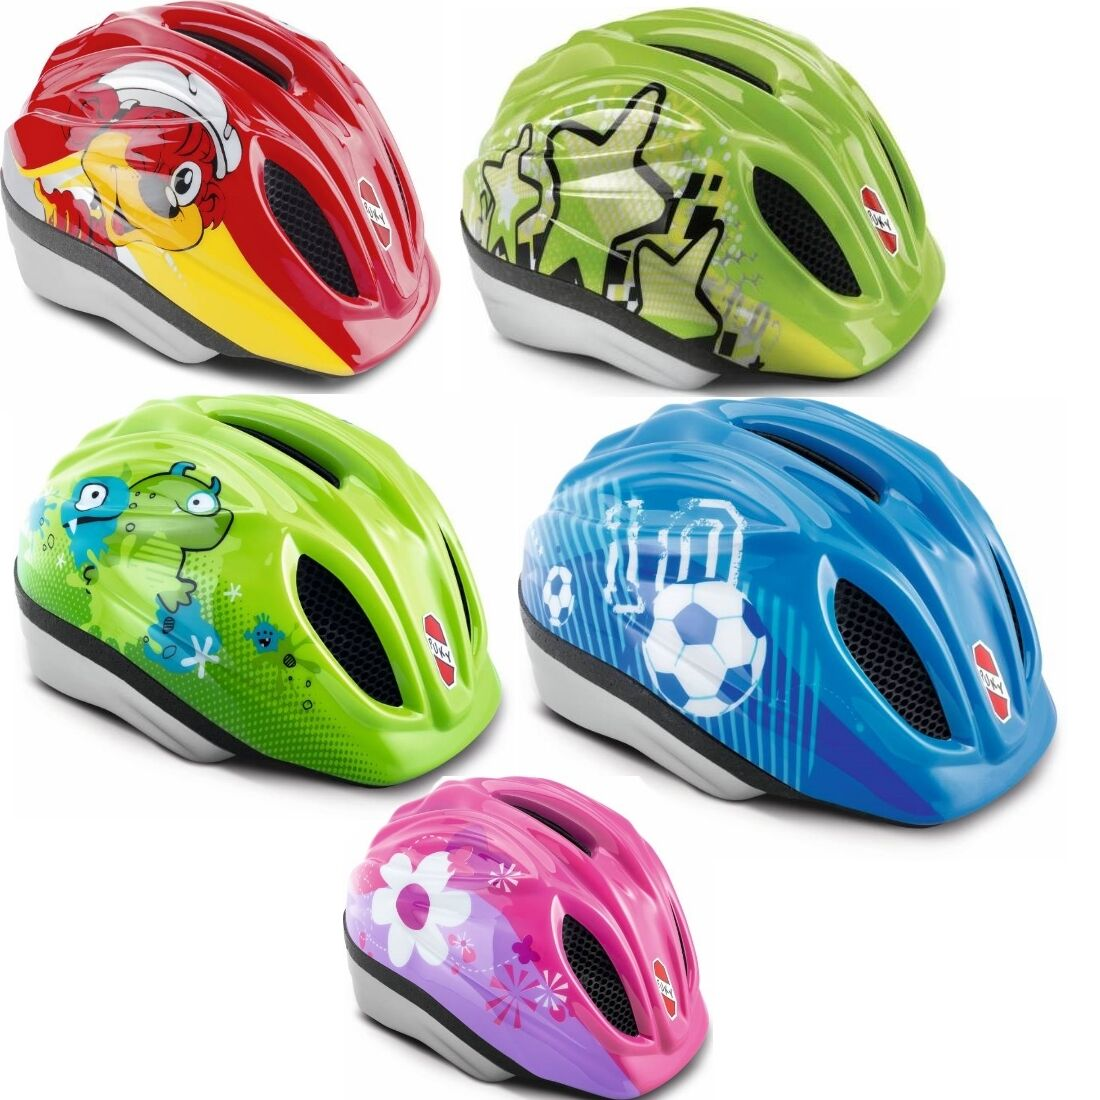 Fahrradhelm Radhelm Puky Helm Kinderfahrradhelm Kinderhelm Kinderhelm Kinderhelm XS S M M L Schutzhelm    Online Shop Europe  cb3a50